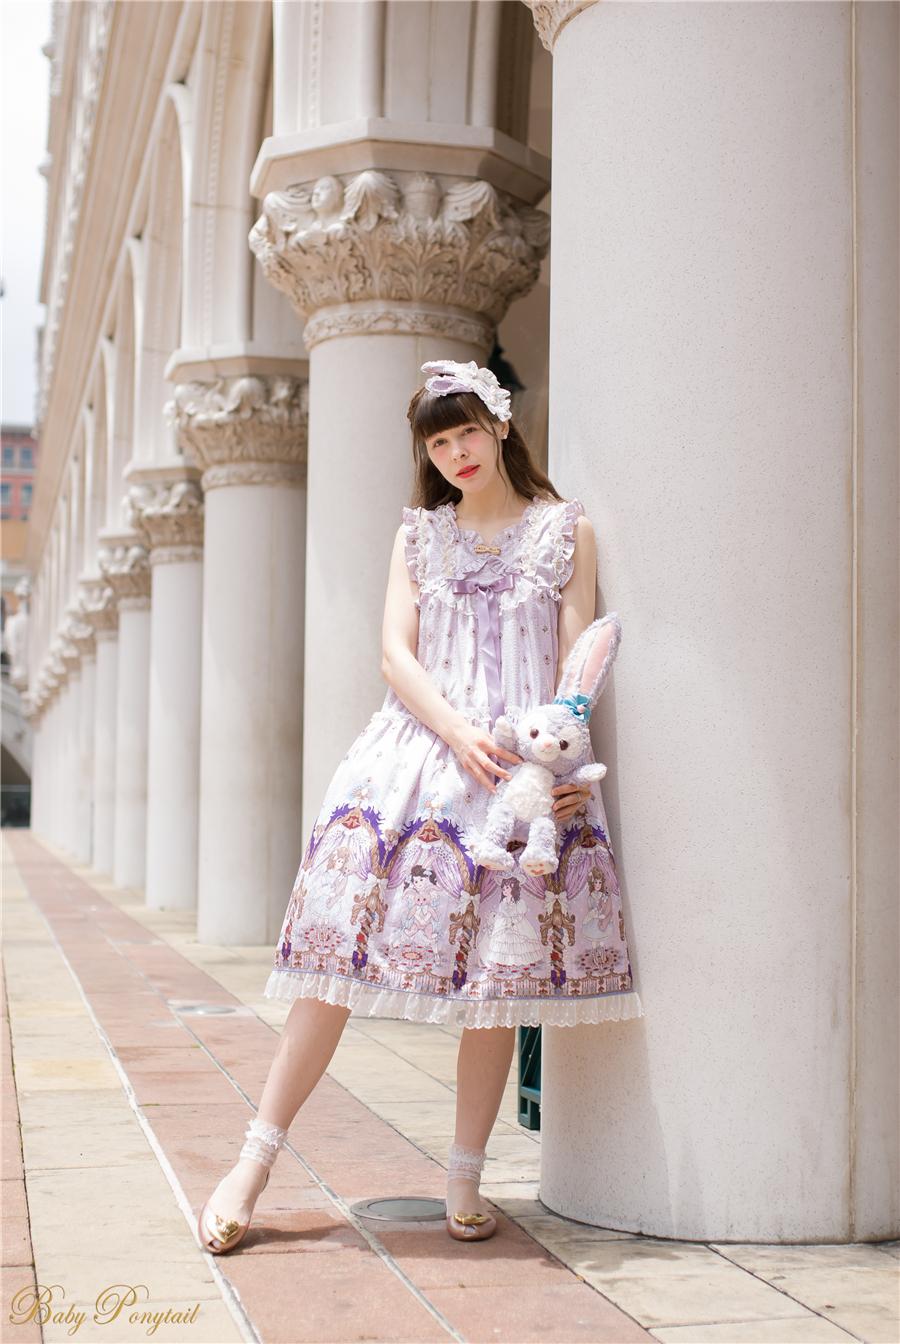 BabyPonytail_Model Preview_My Favorite Companion_Purple JSK_NG-2_Claudia_02.jpg